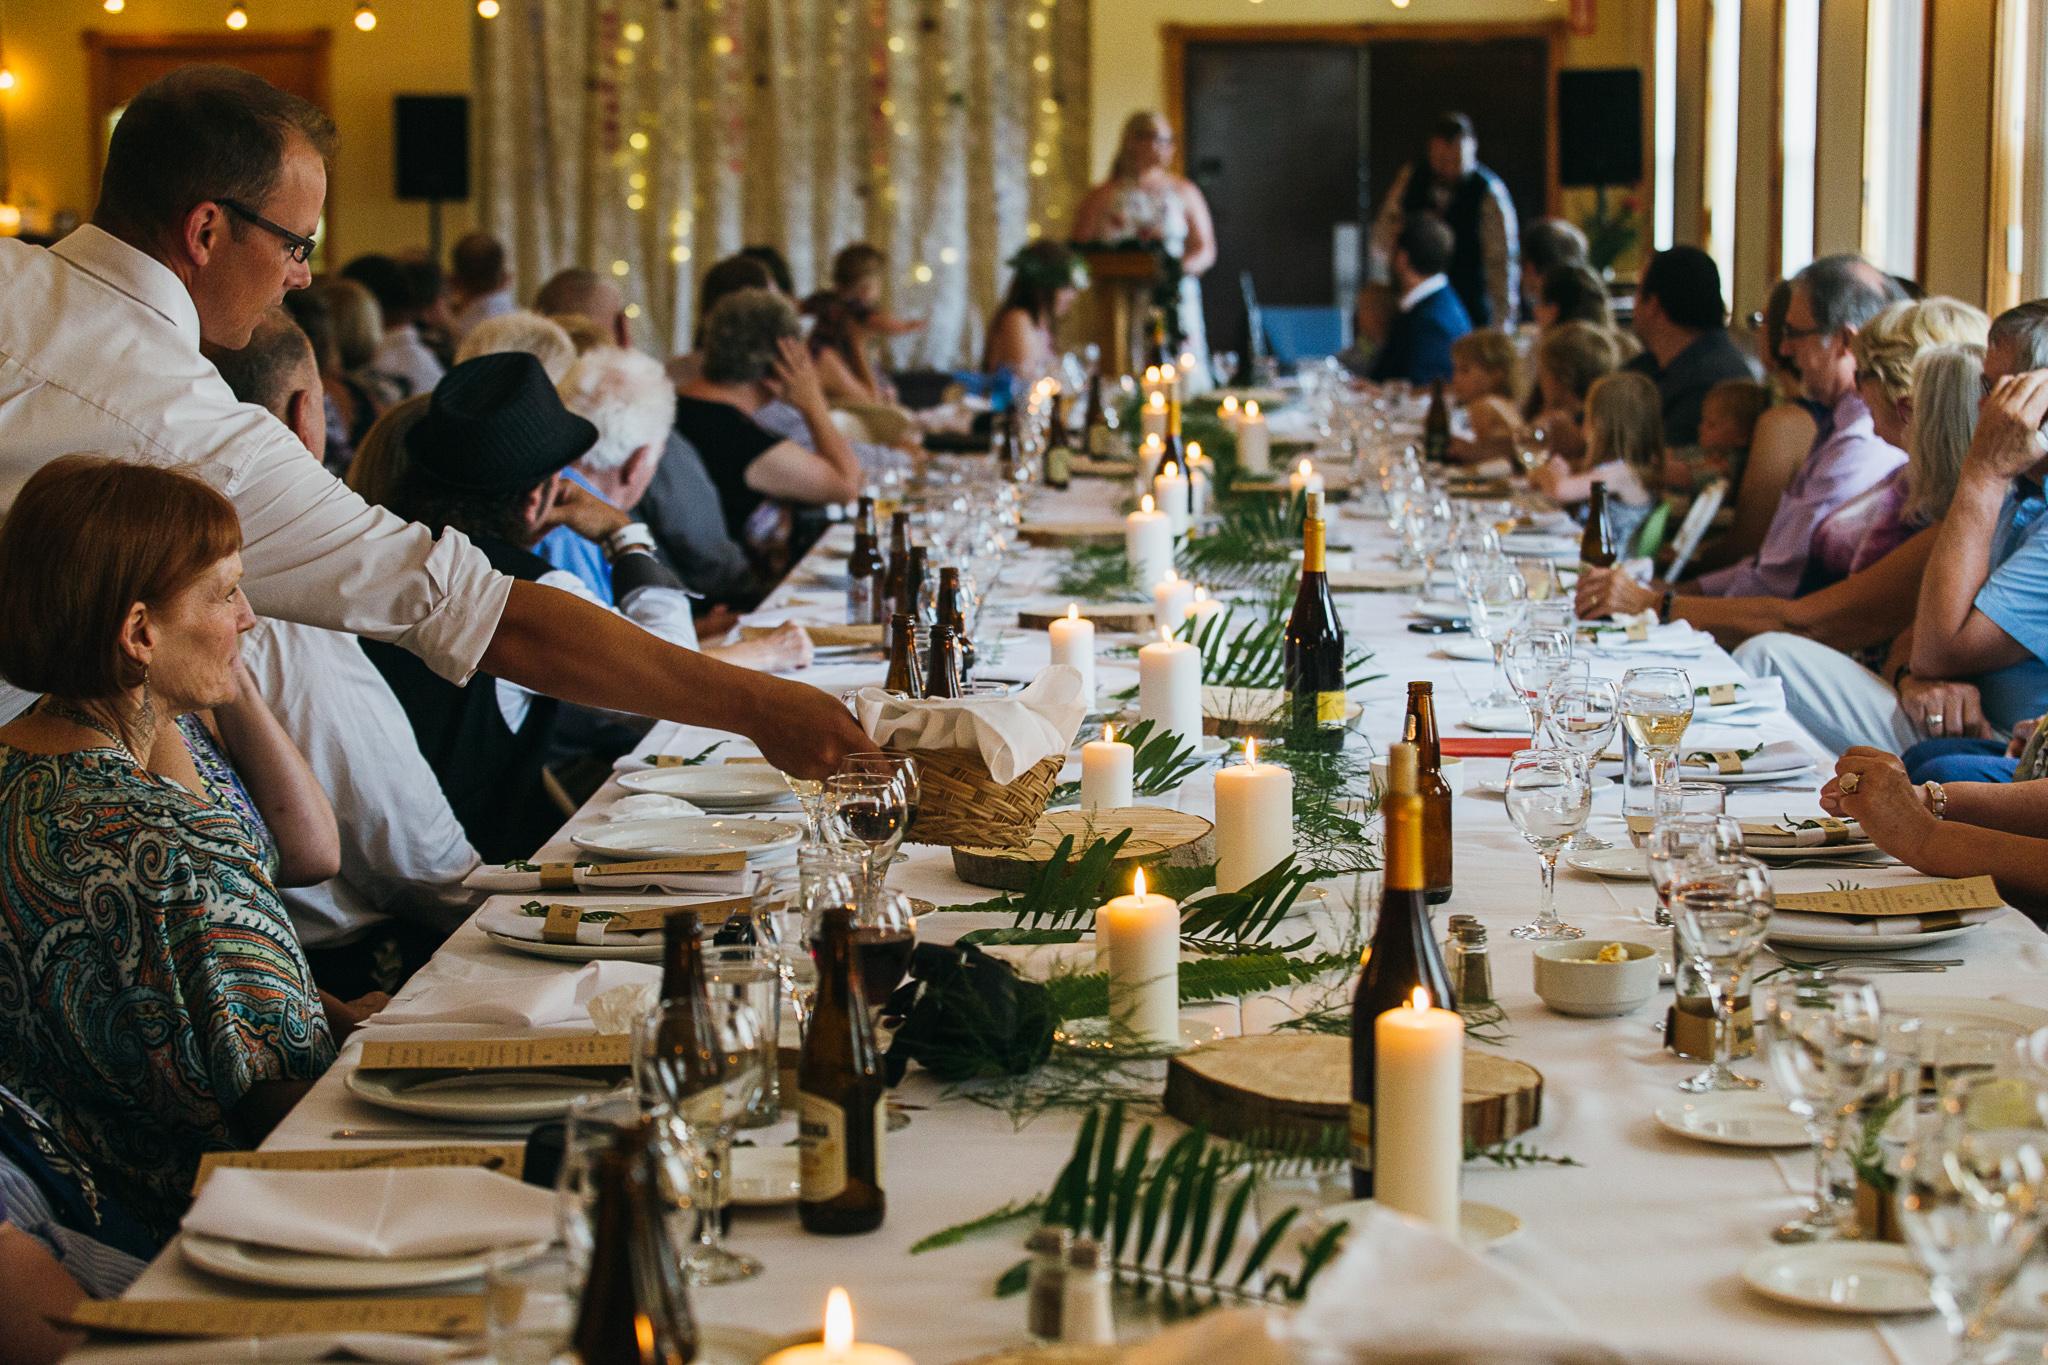 Intimate Backyard Wedding in Bancroft (123 of 143).jpg